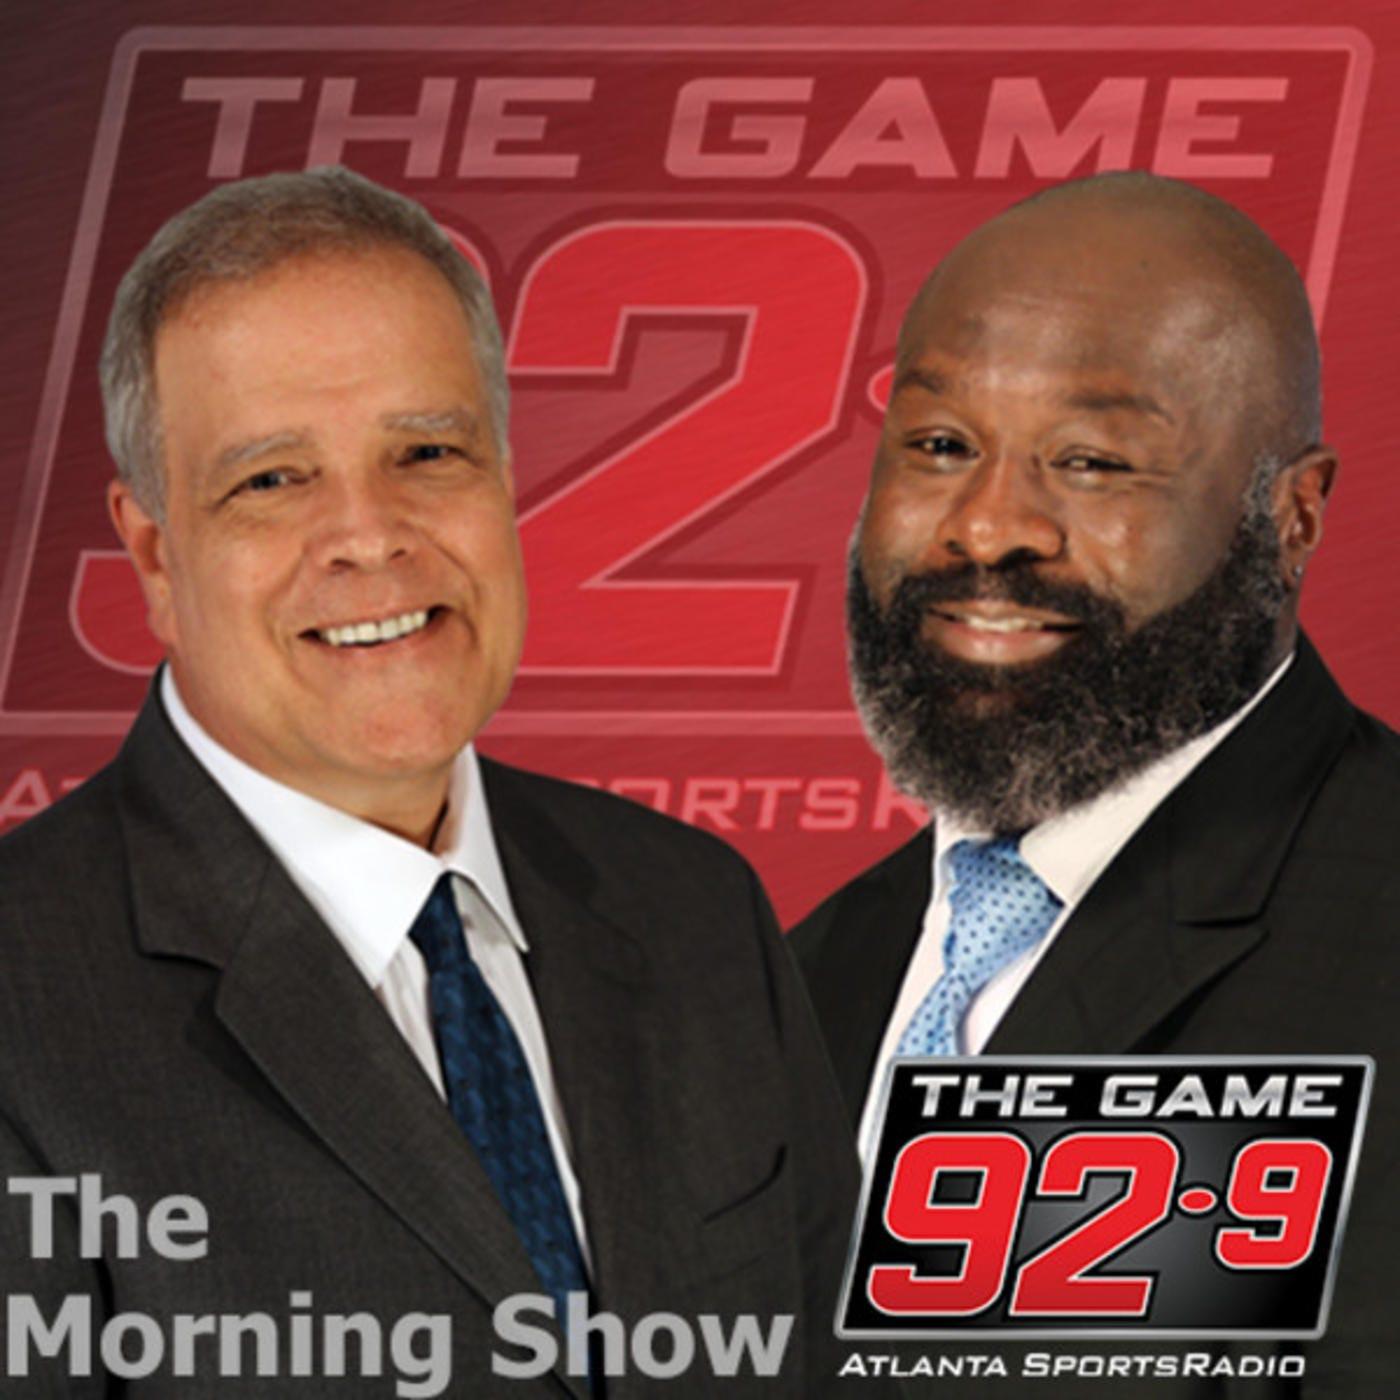 The Morning Show w/ John and Hugh